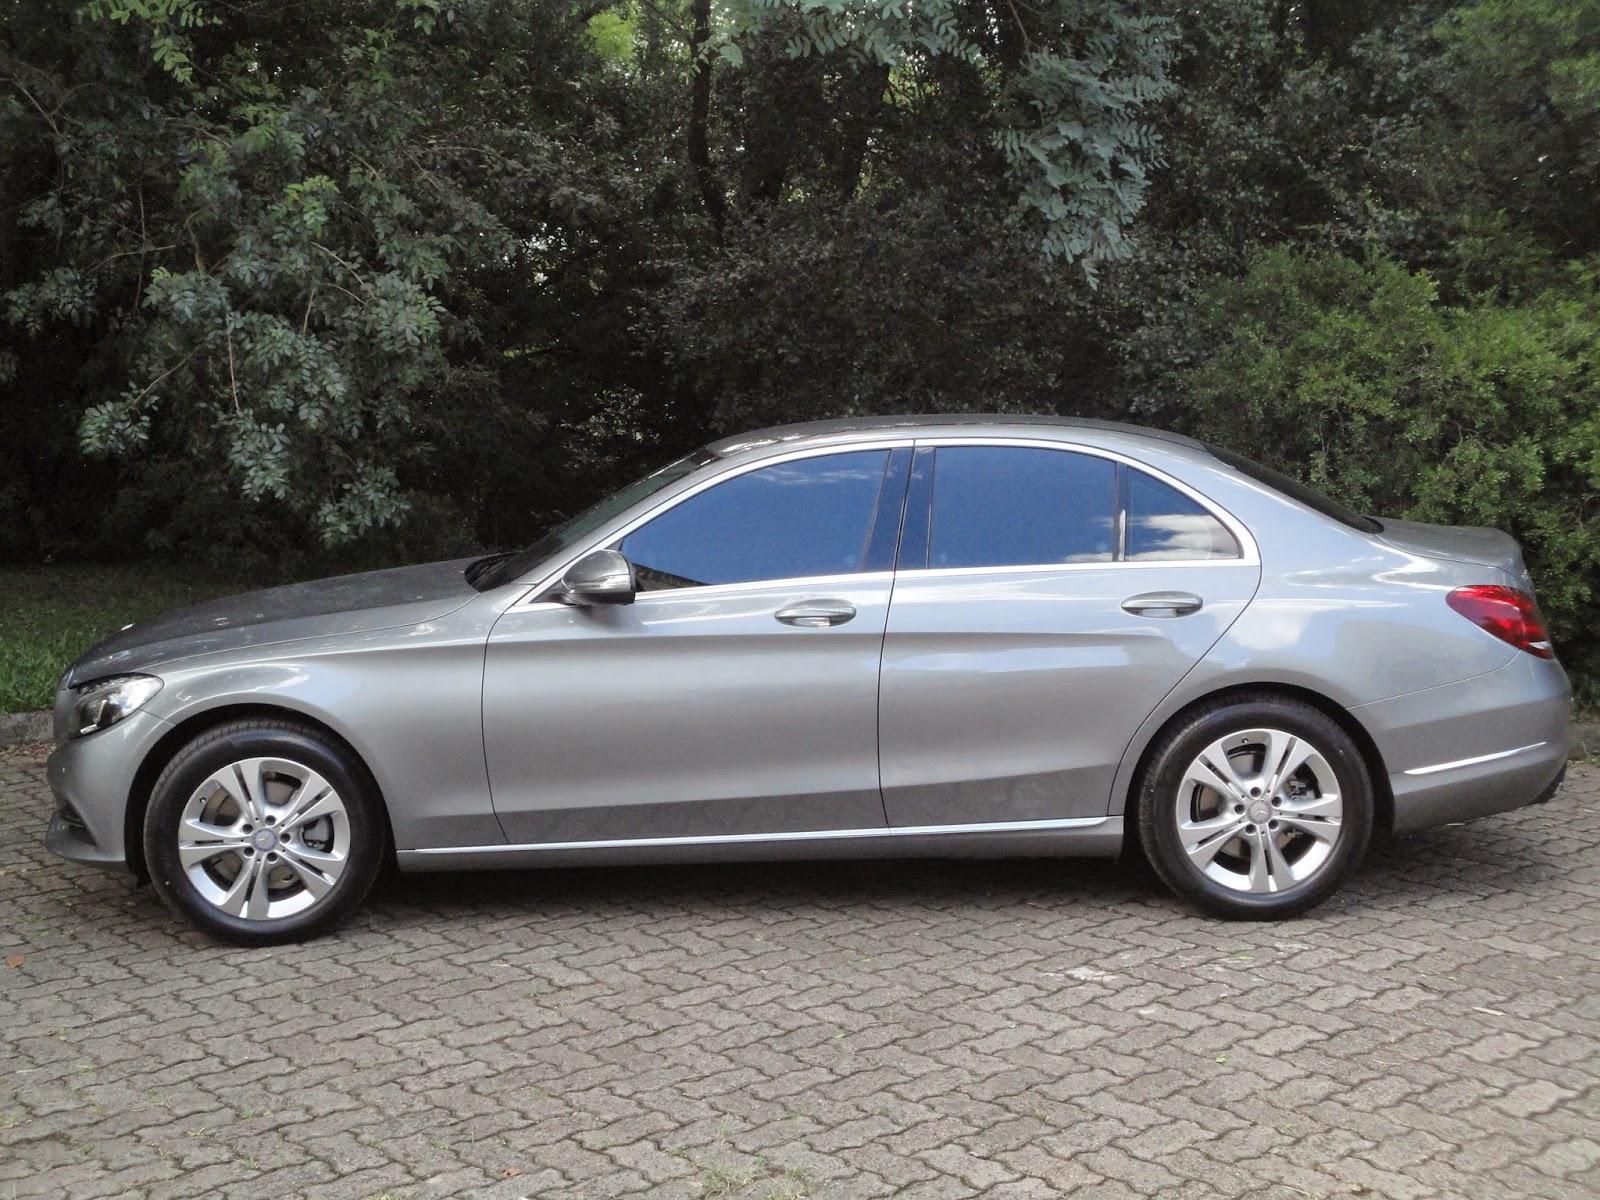 Mercedes benz c180 mercedes benz gla chrysler 300c preto for Mercedes benz 300c